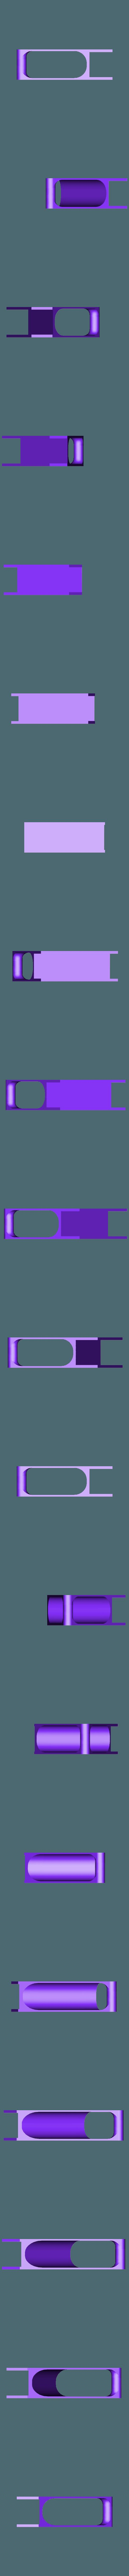 Rear_Landing_Gear.stl Download free STL file Experimental Multirotor • 3D printable model, SeanTheITGuy